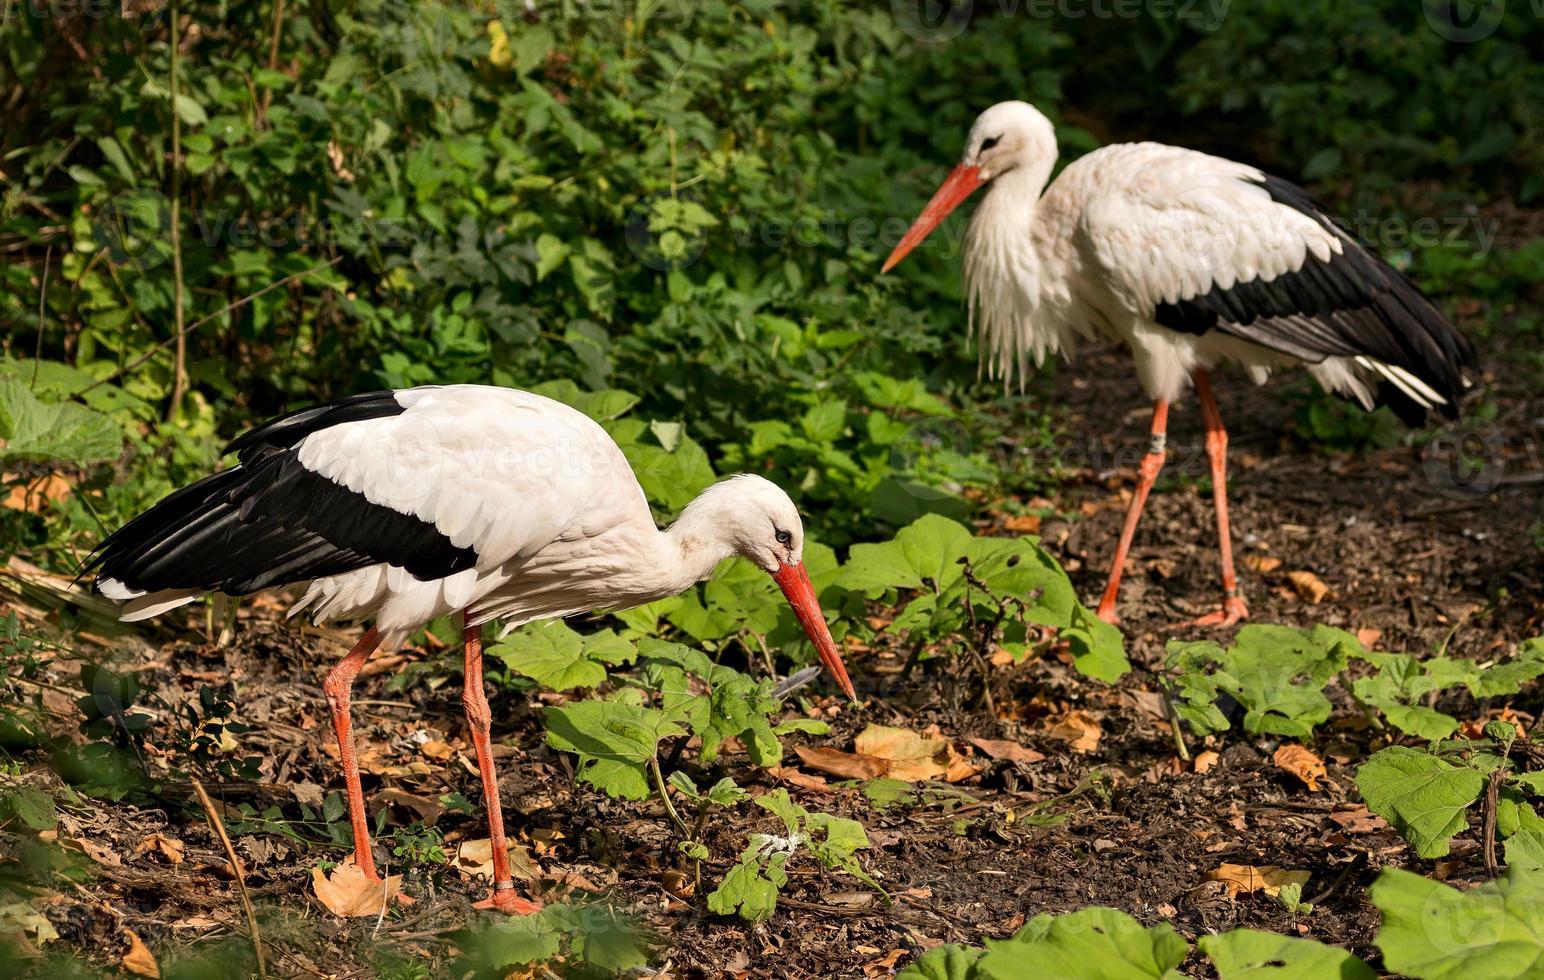 Couple of White storks photo